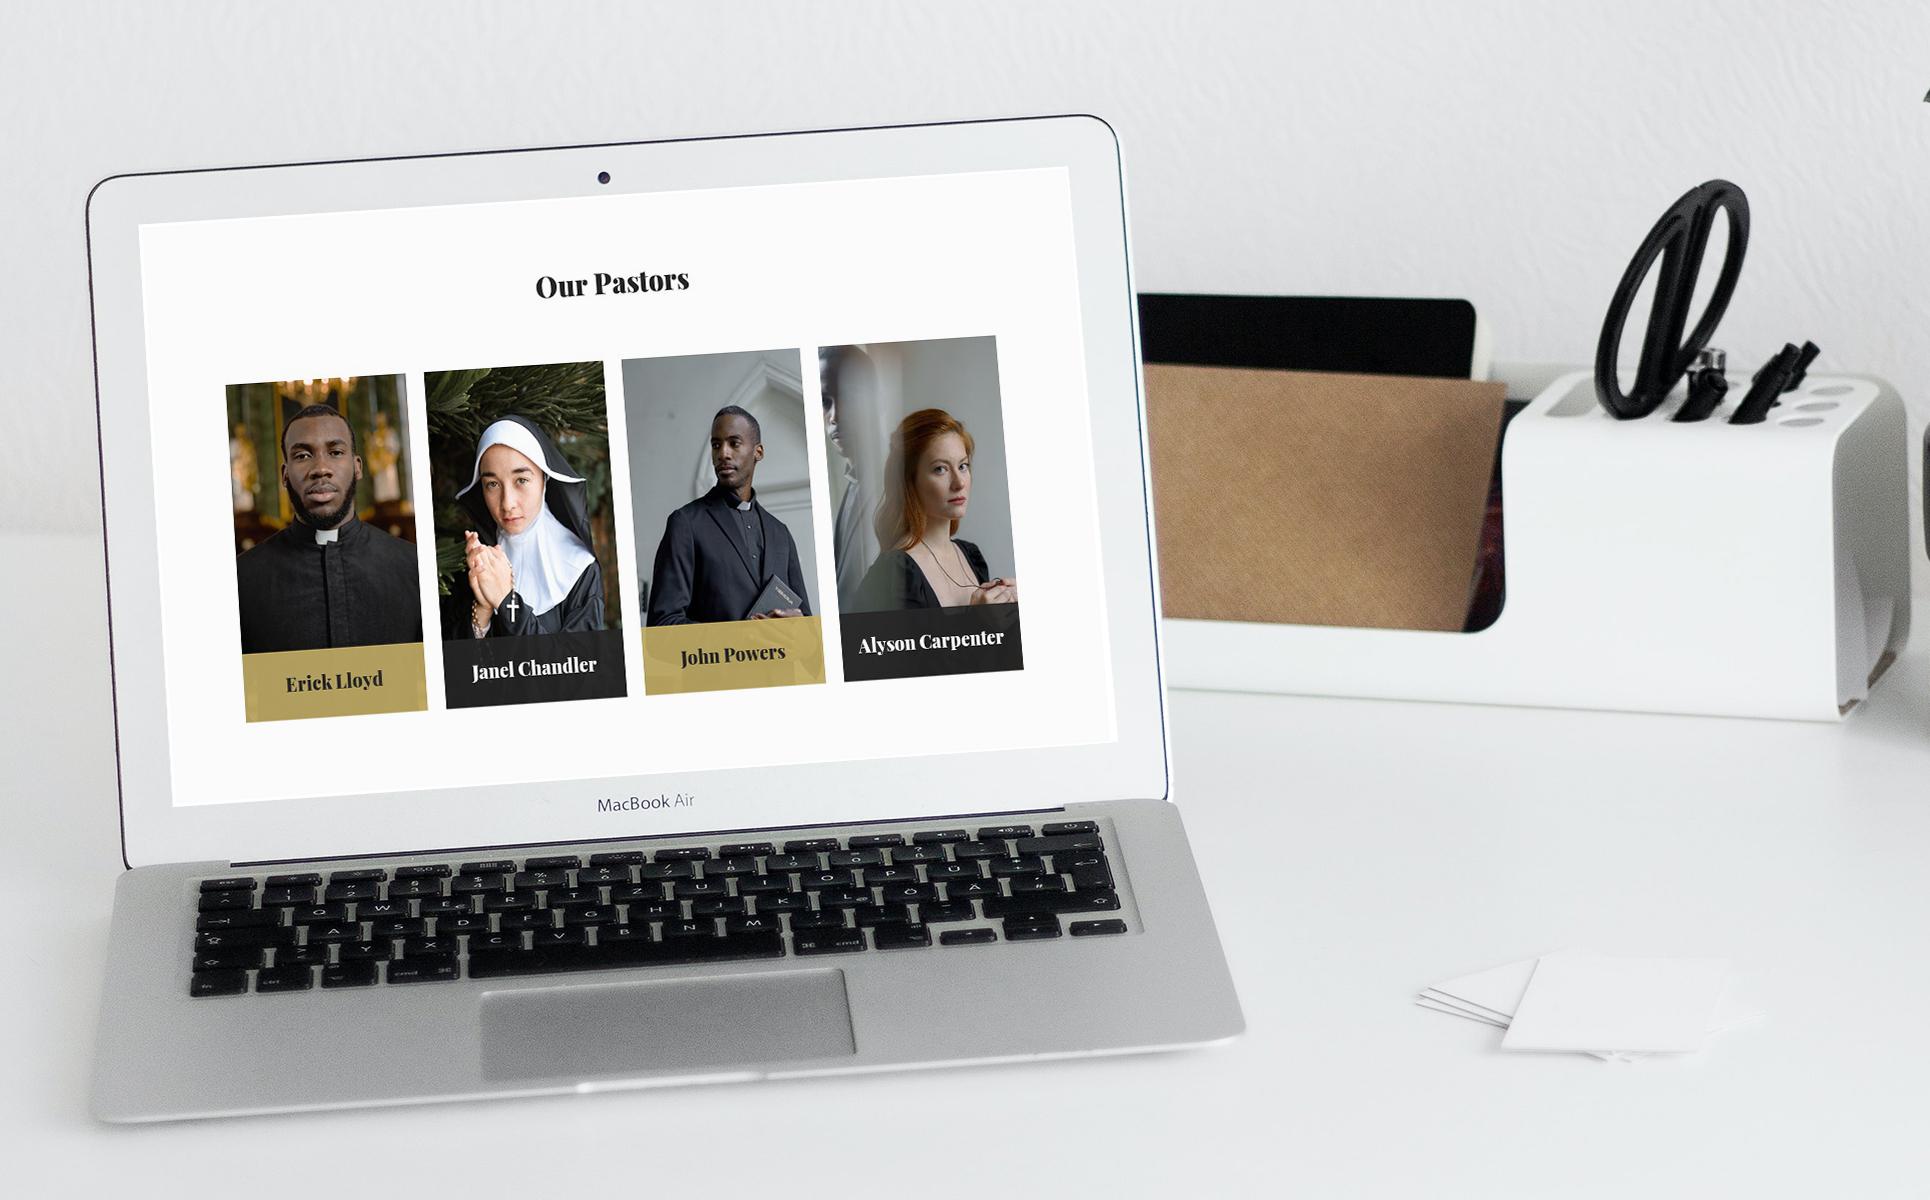 50 Slides Church Presentation Template: Powerpoint, Google Slides & Keynote